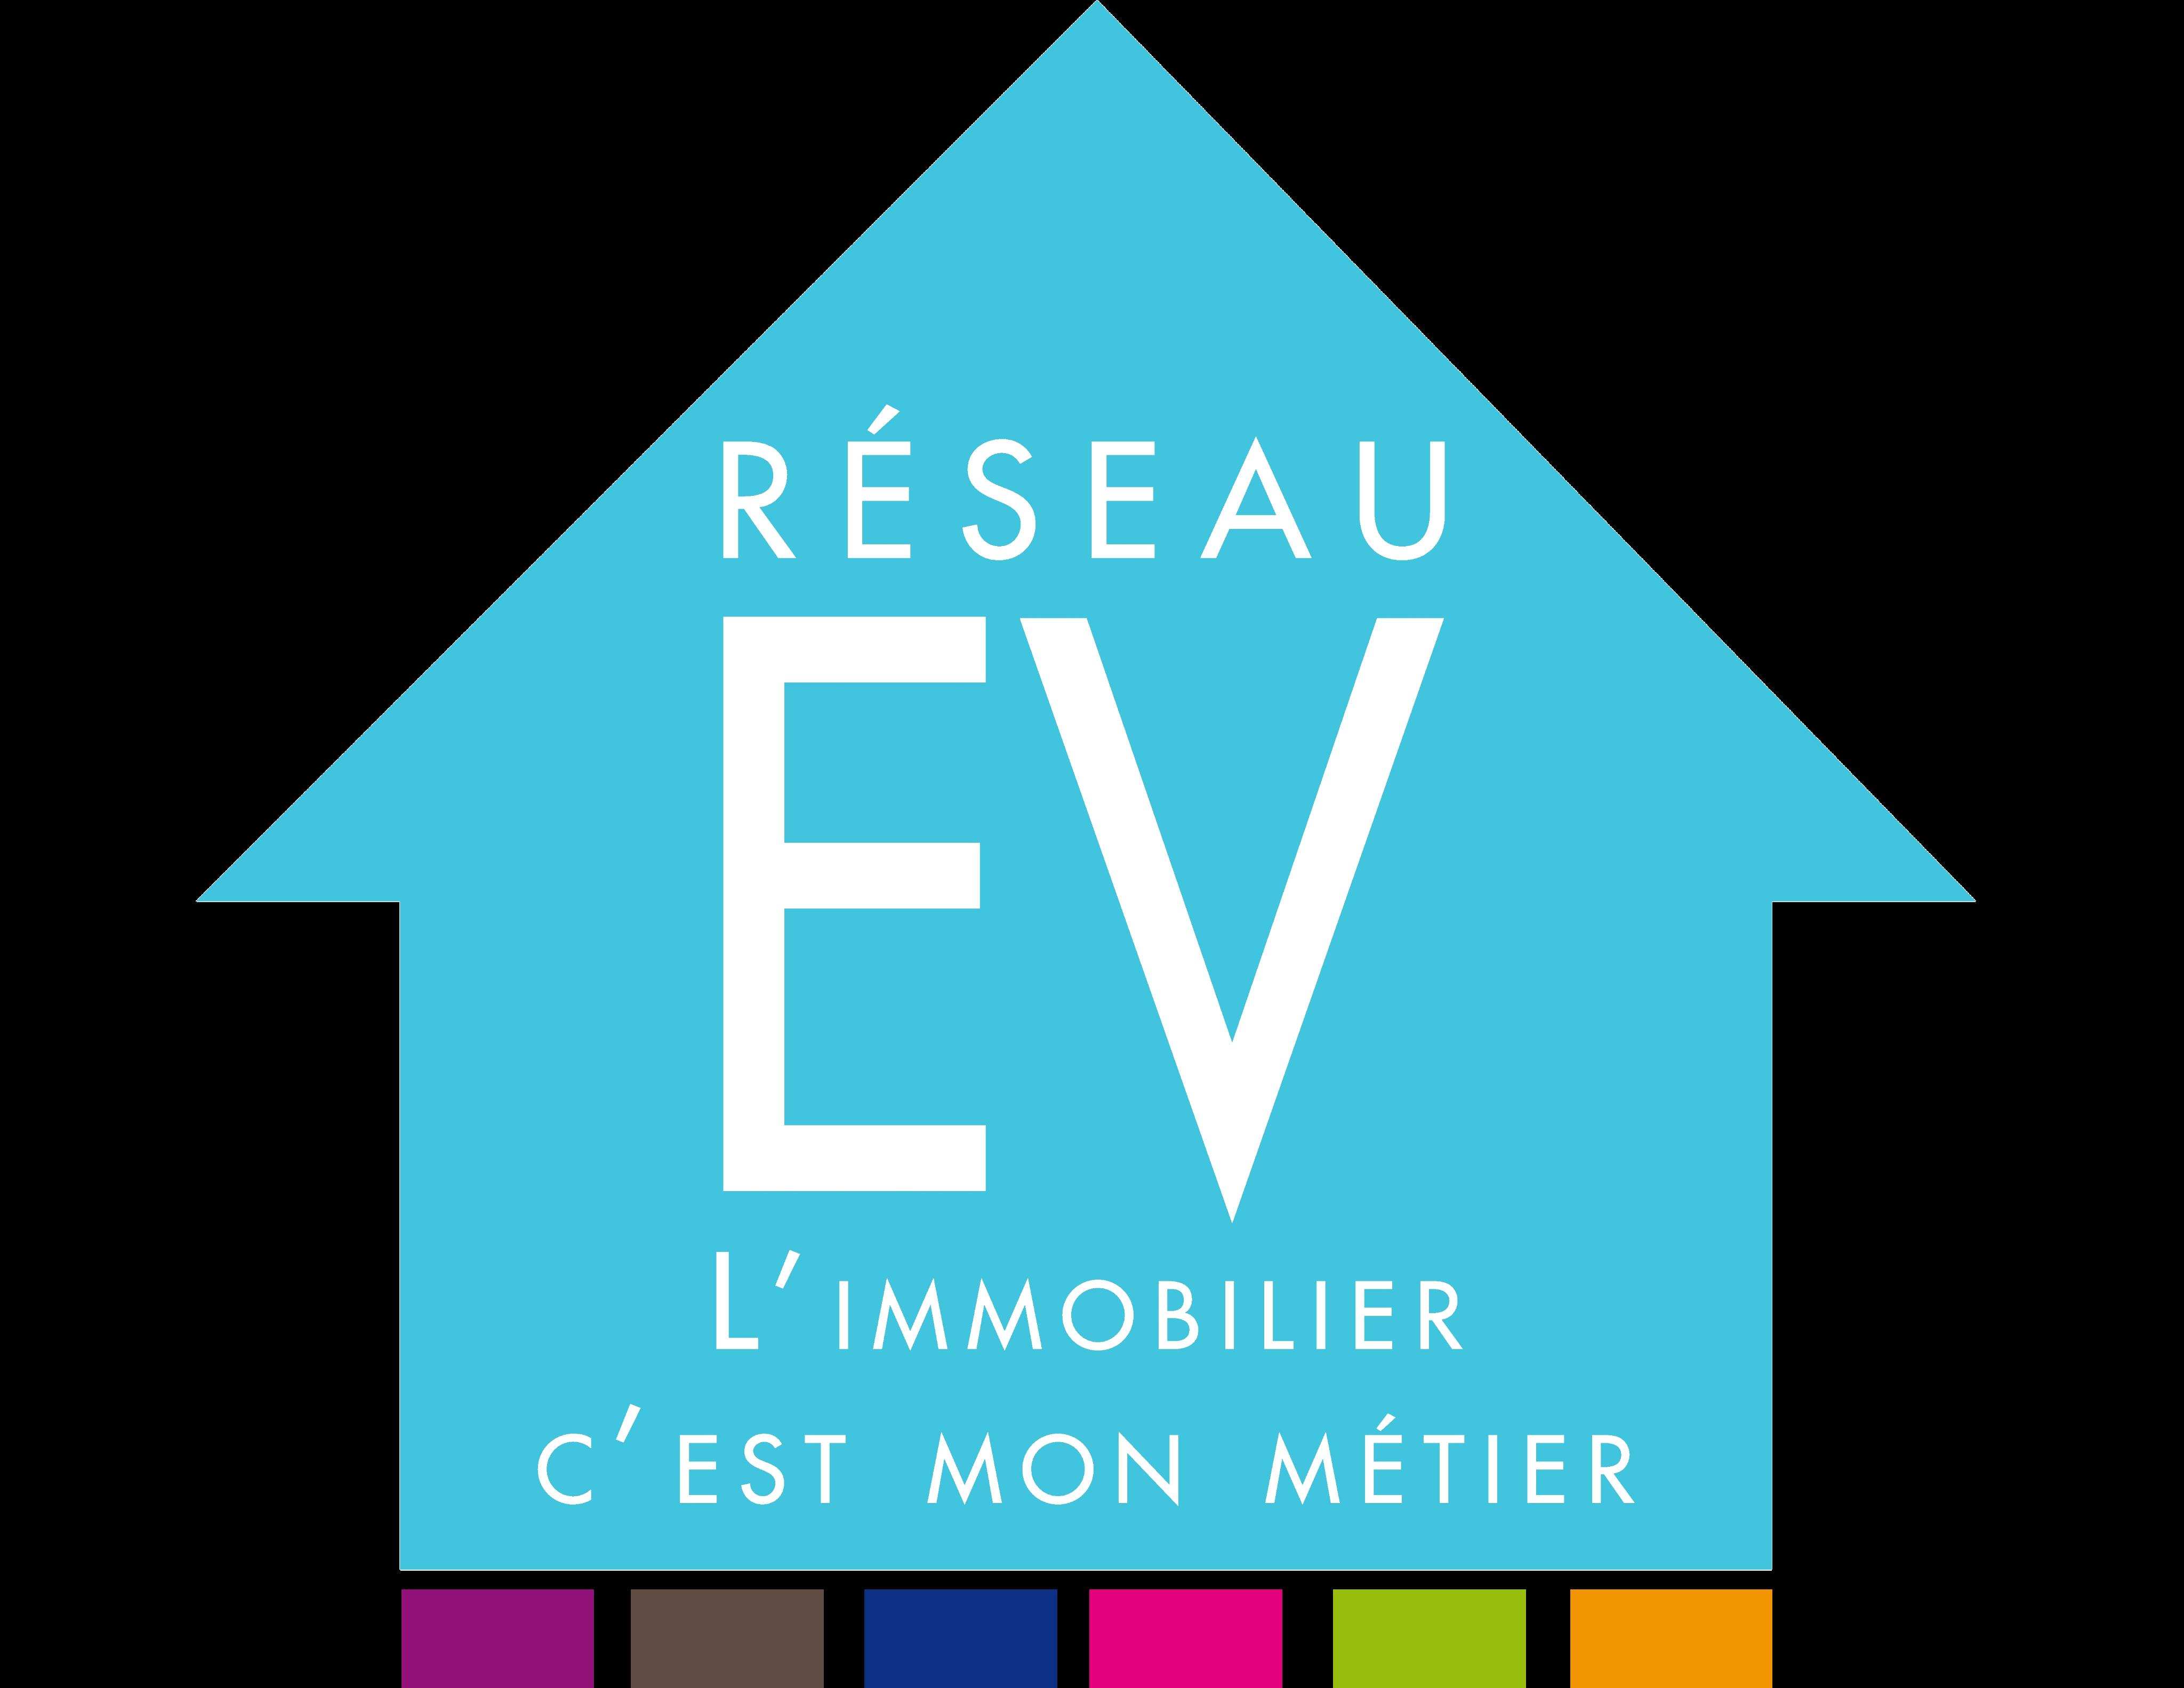 Reseau Ev Immo agence immobilière Lyon 9 (69009)